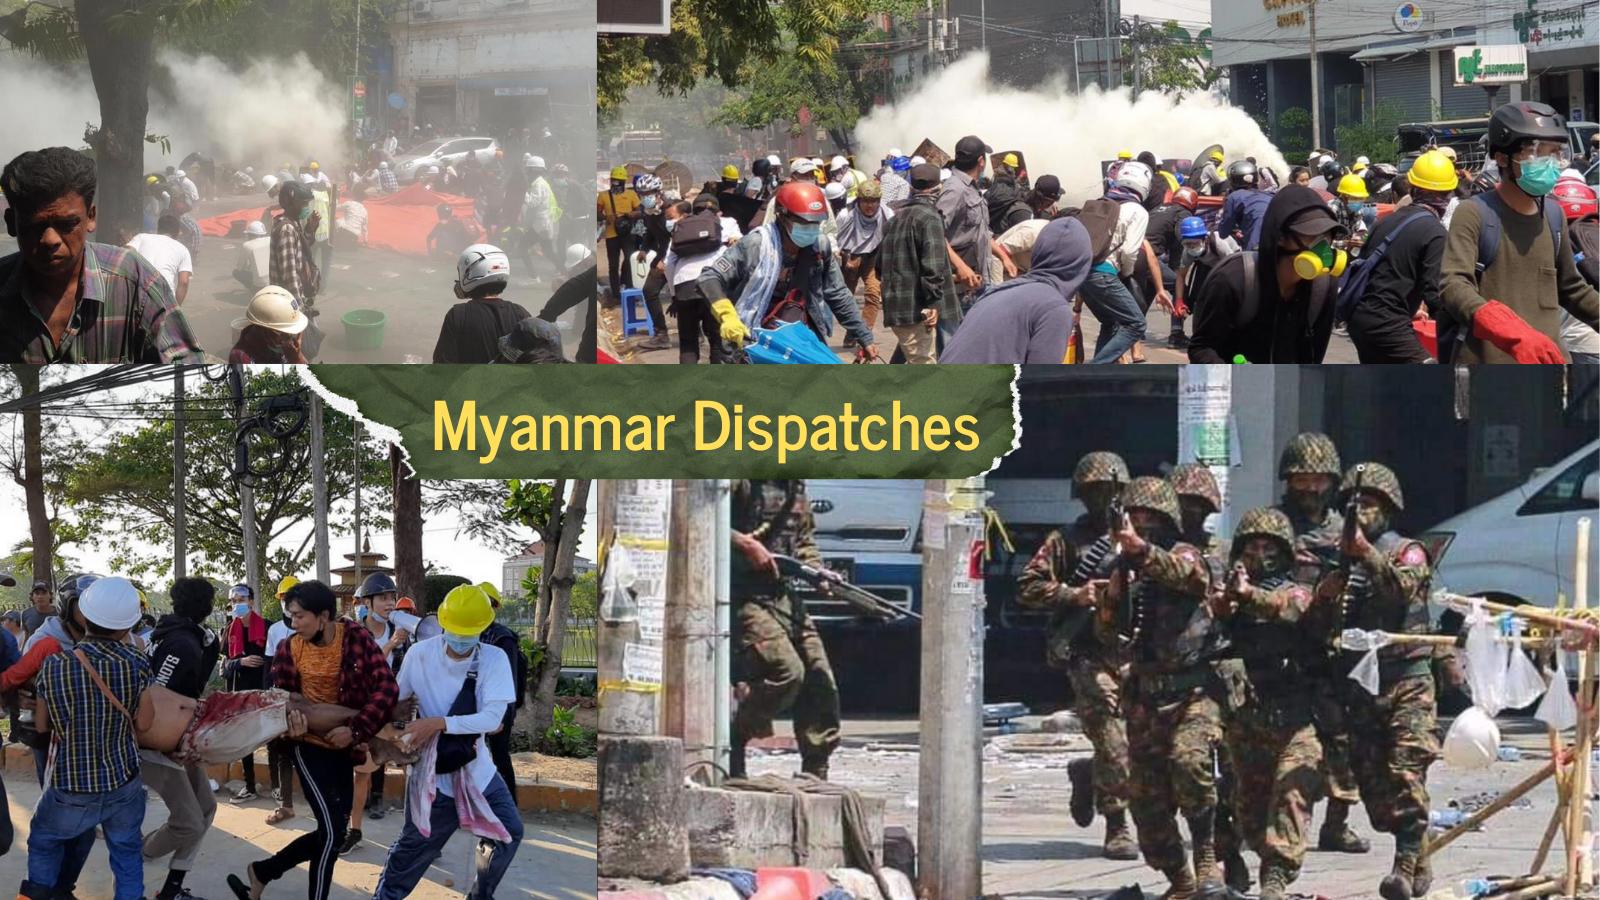 Myanmar: military junta continues bloody crackdown on protesters despite UN condemnation